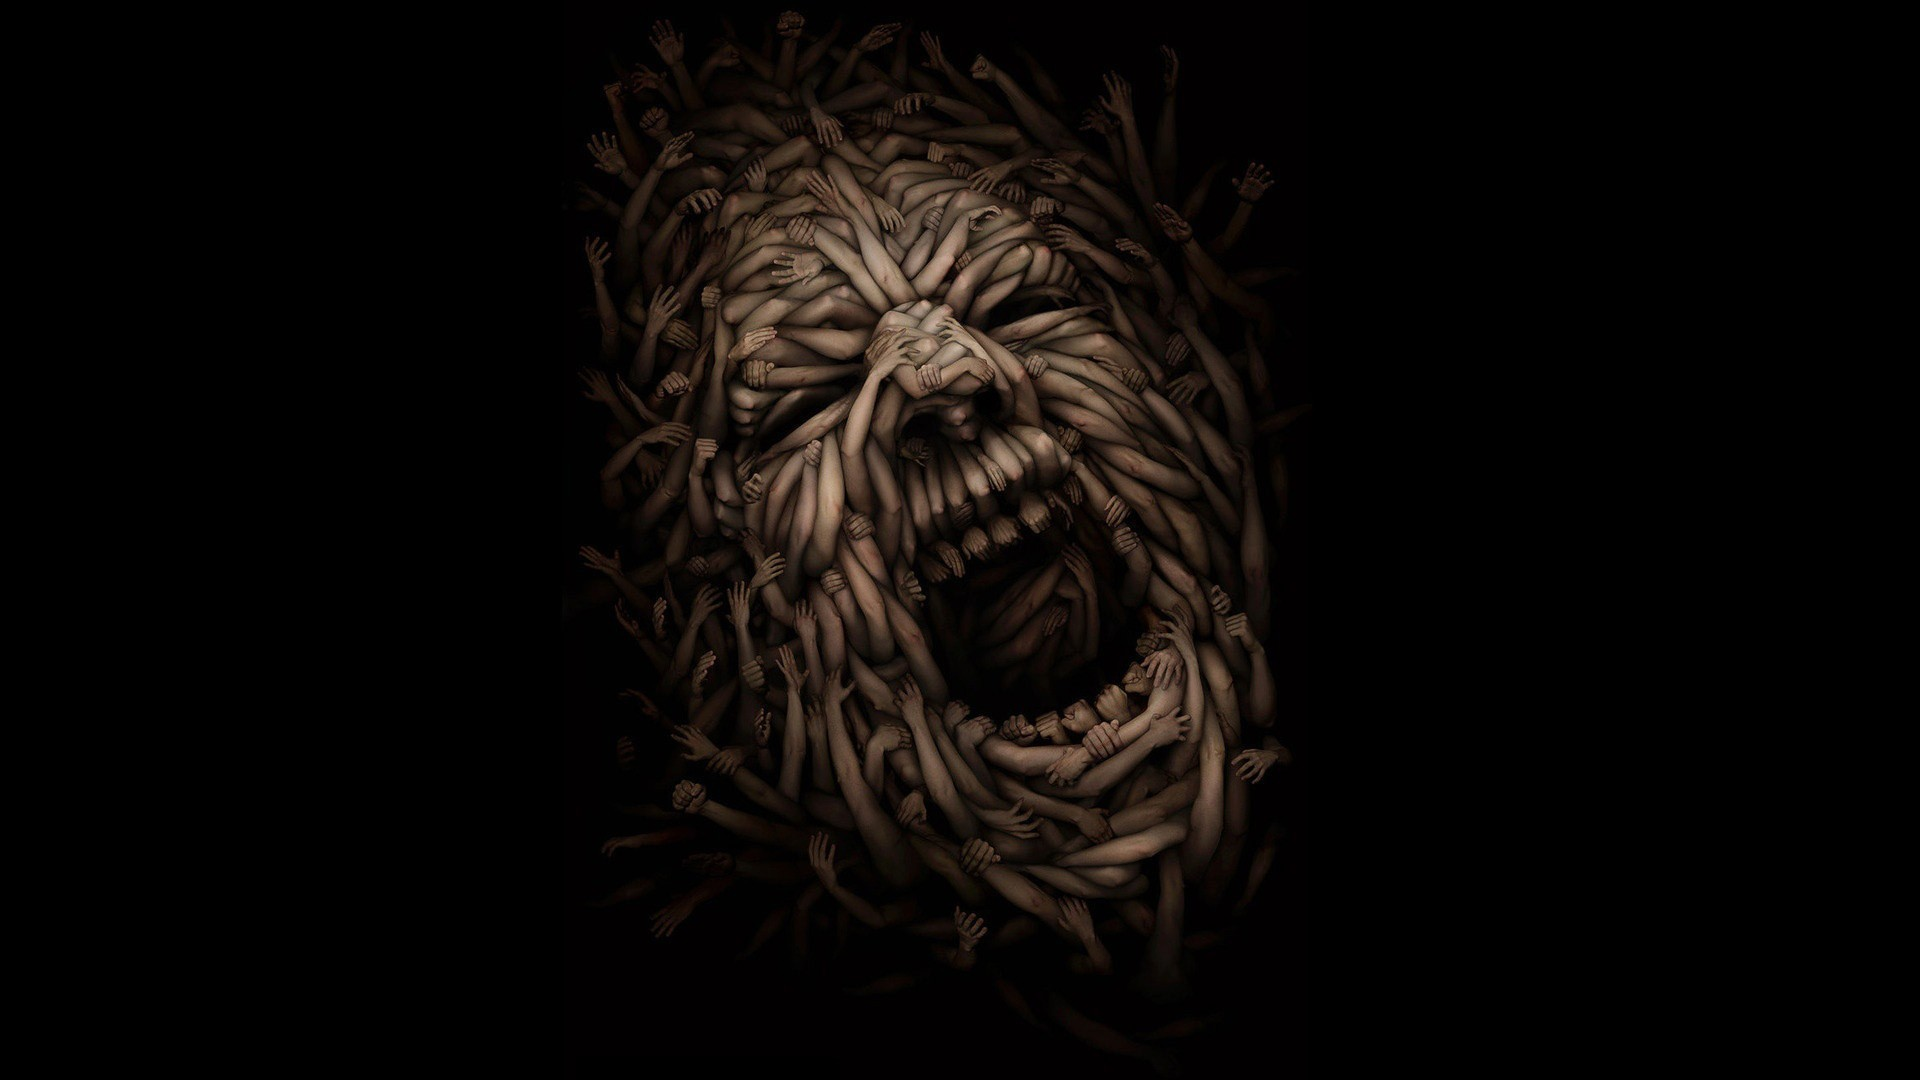 Faces Hands Illusions Screaming Skulls